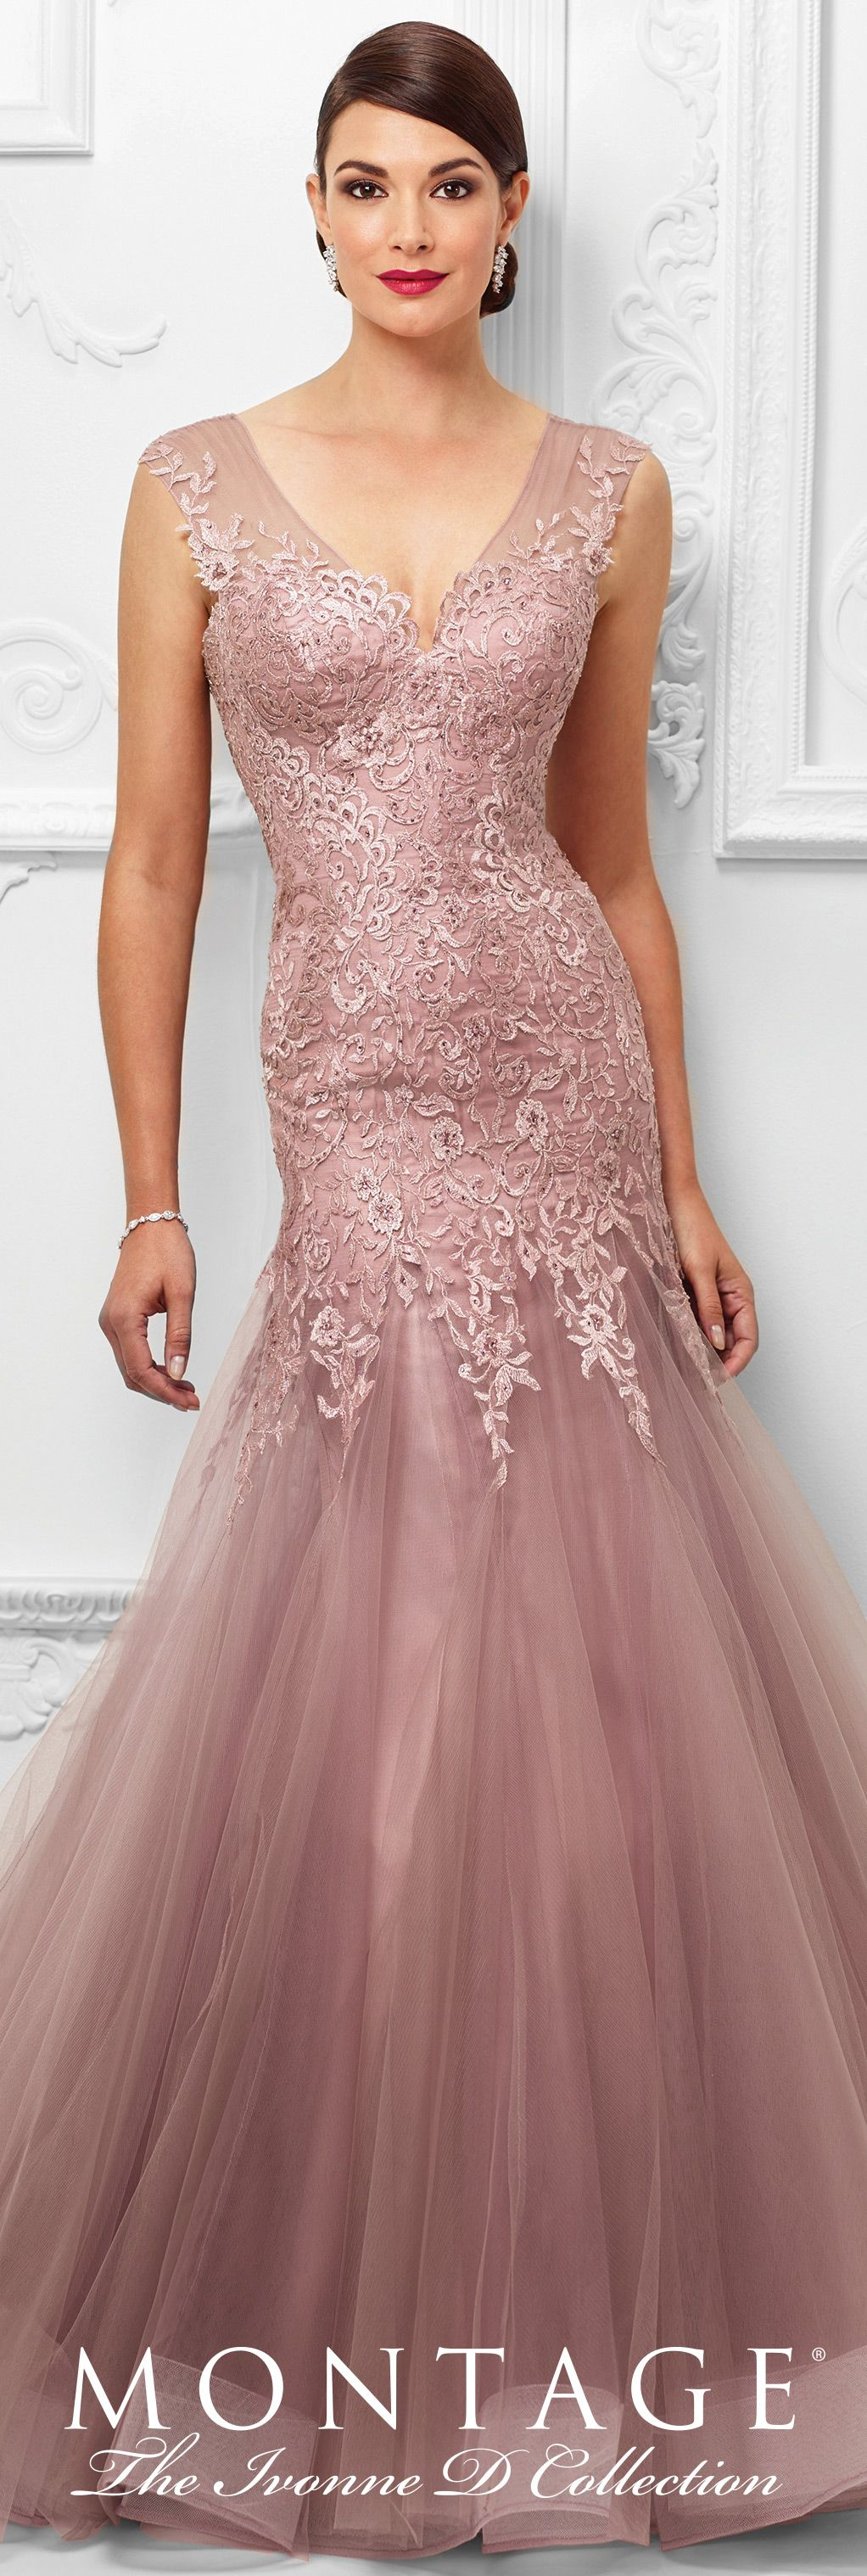 Ivonne D - Evening Dresses - 117D65 | Vestiditos, Vestidos de fiesta ...